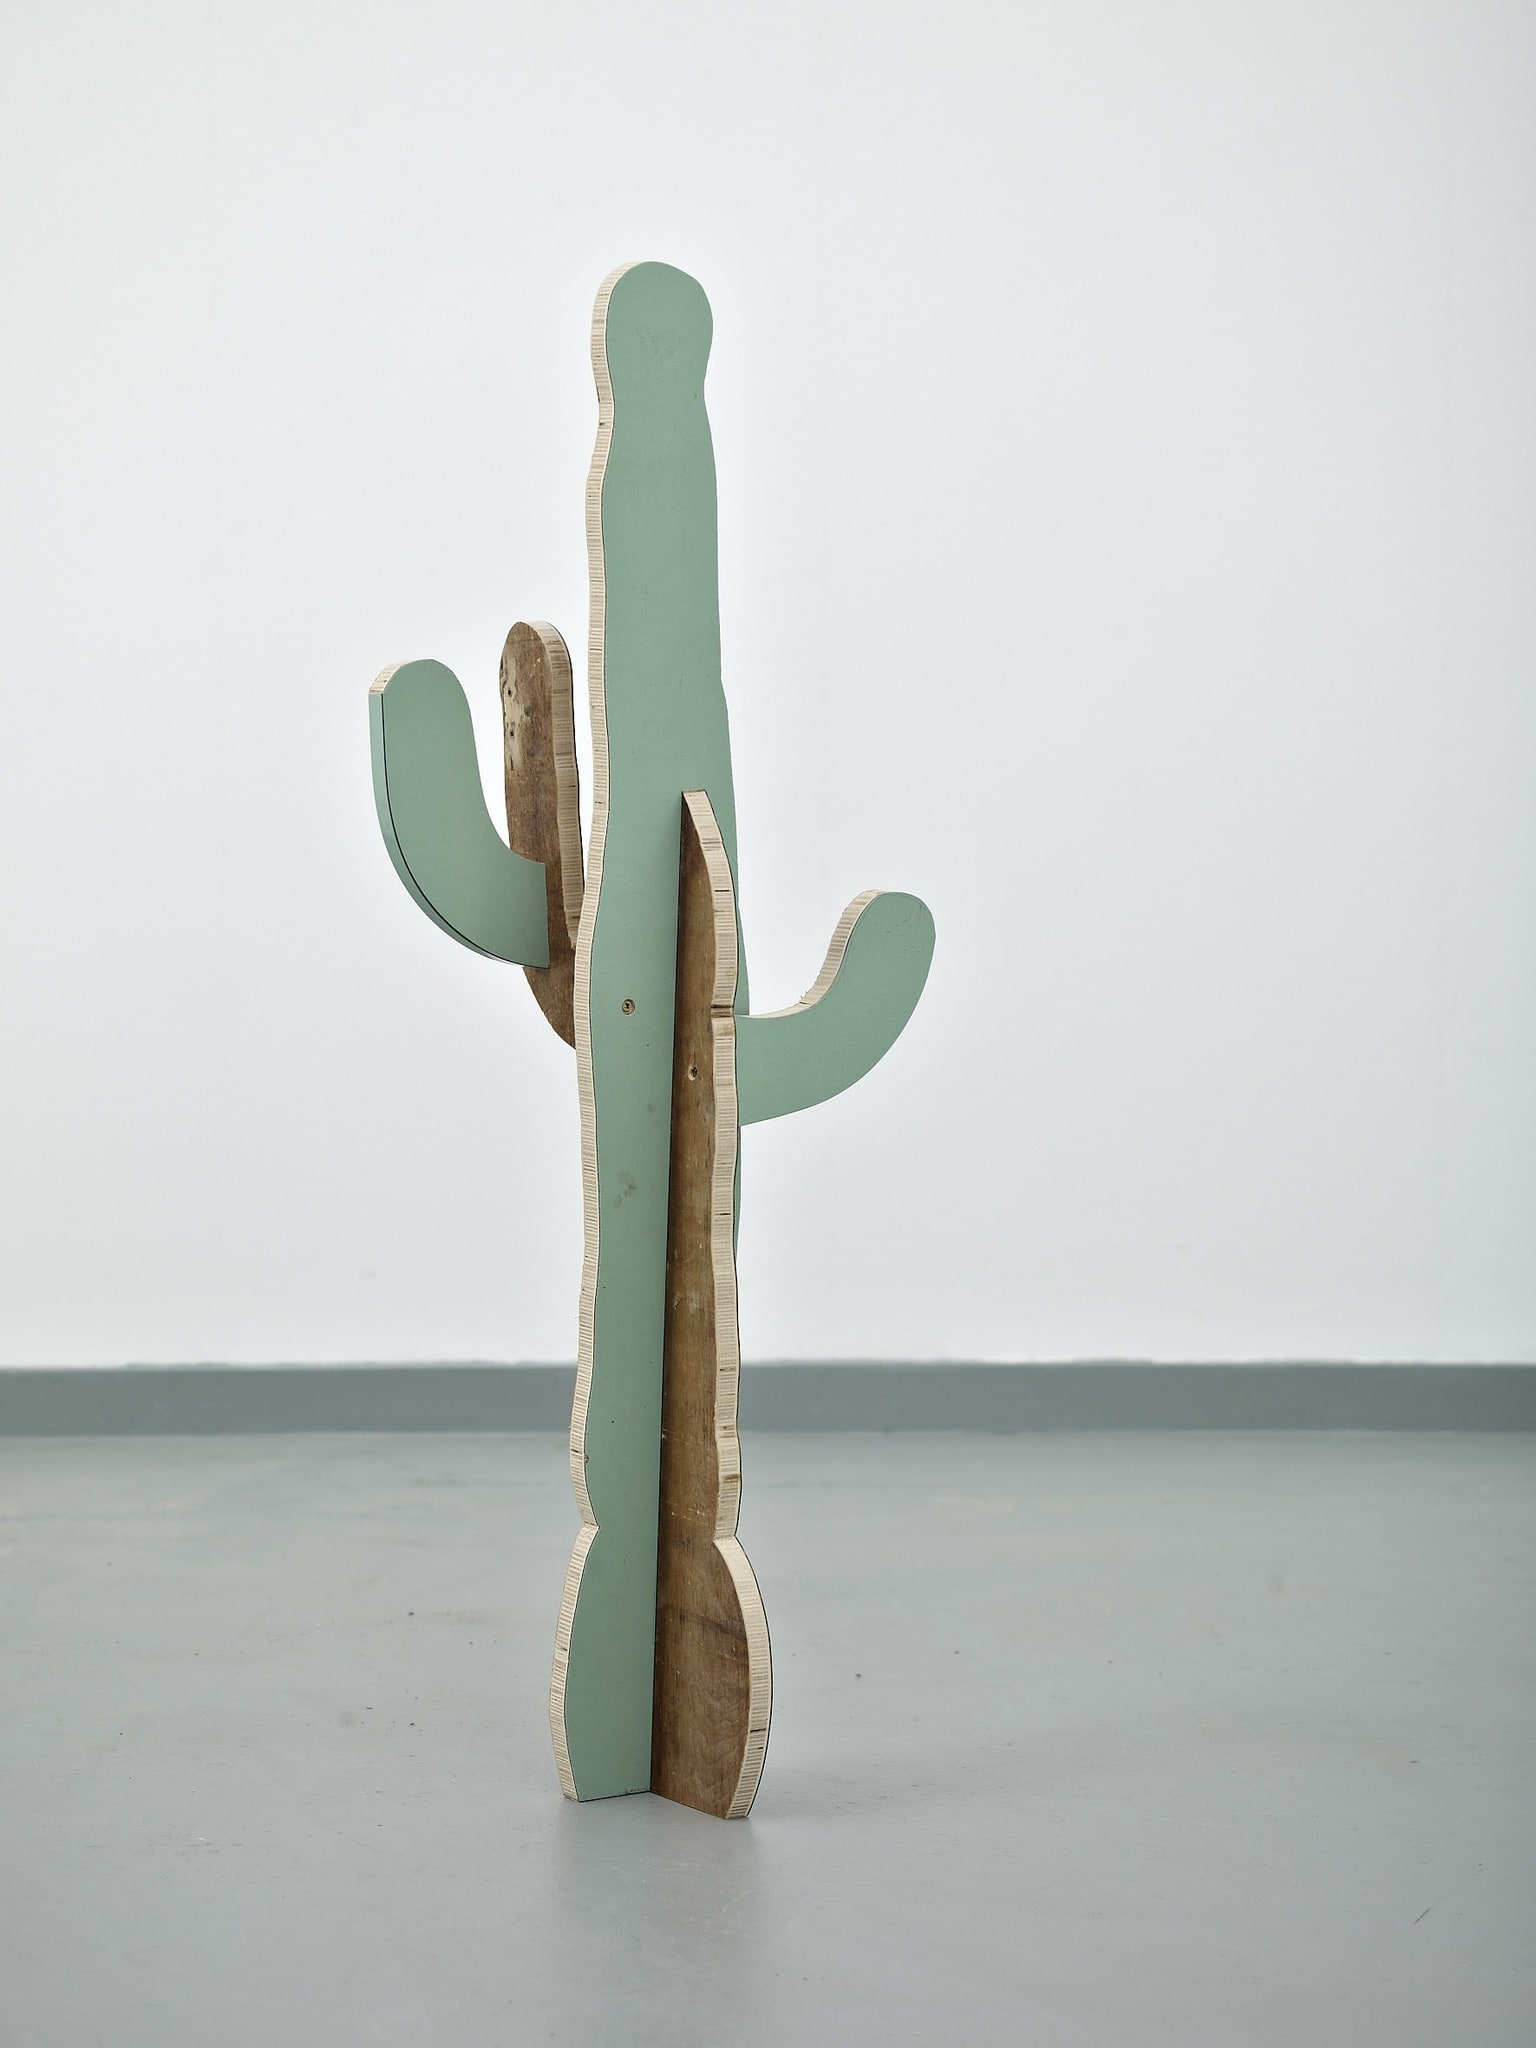 <span class=&#34;link fancybox-details-link&#34;><a href=&#34;/artists/16-paul-merrick/works/8572/&#34;>View Detail Page</a></span><div class=&#34;artist&#34;><strong>Paul Merrick</strong></div> <div class=&#34;title&#34;><em>Cactus (Saguaro)</em>, 2014</div> <div class=&#34;medium&#34;>Melamine</div> <div class=&#34;dimensions&#34;>105 x 40 x 40 cm<br />41 3/8 x 15 3/4 x 15 3/4 in</div><div class=&#34;copyright_line&#34;>Copyright The Artist</div>